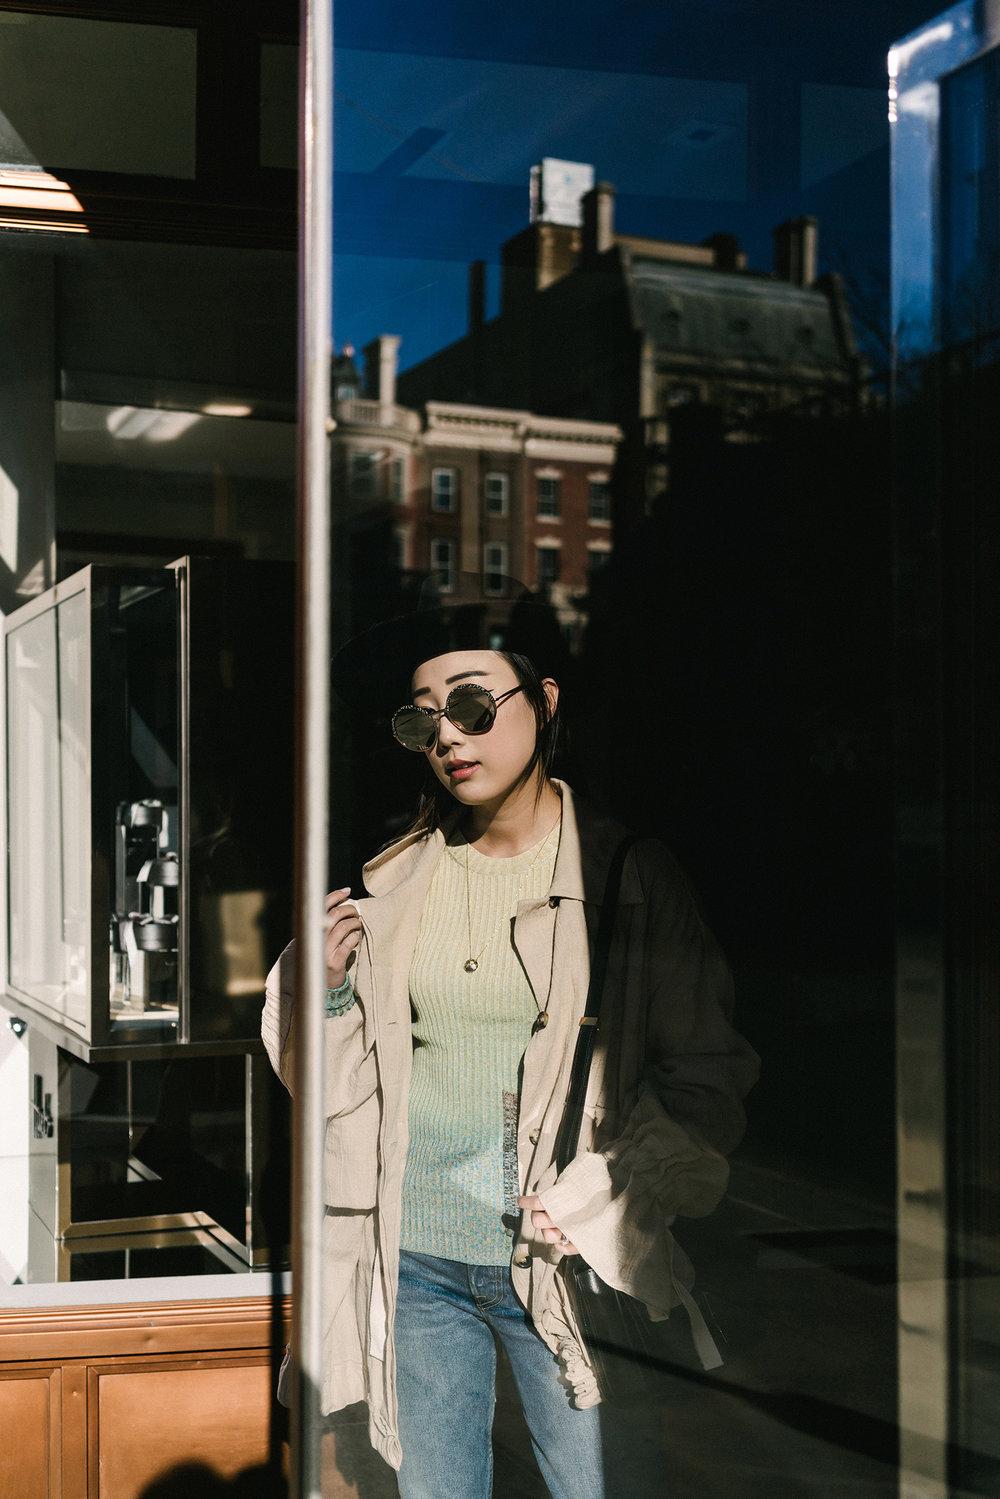 Loewe Jacket, Acne Studios Sweater, Grlfrnd Denim, The Row Shoes, Céline Bag, Janessa Leone Hat